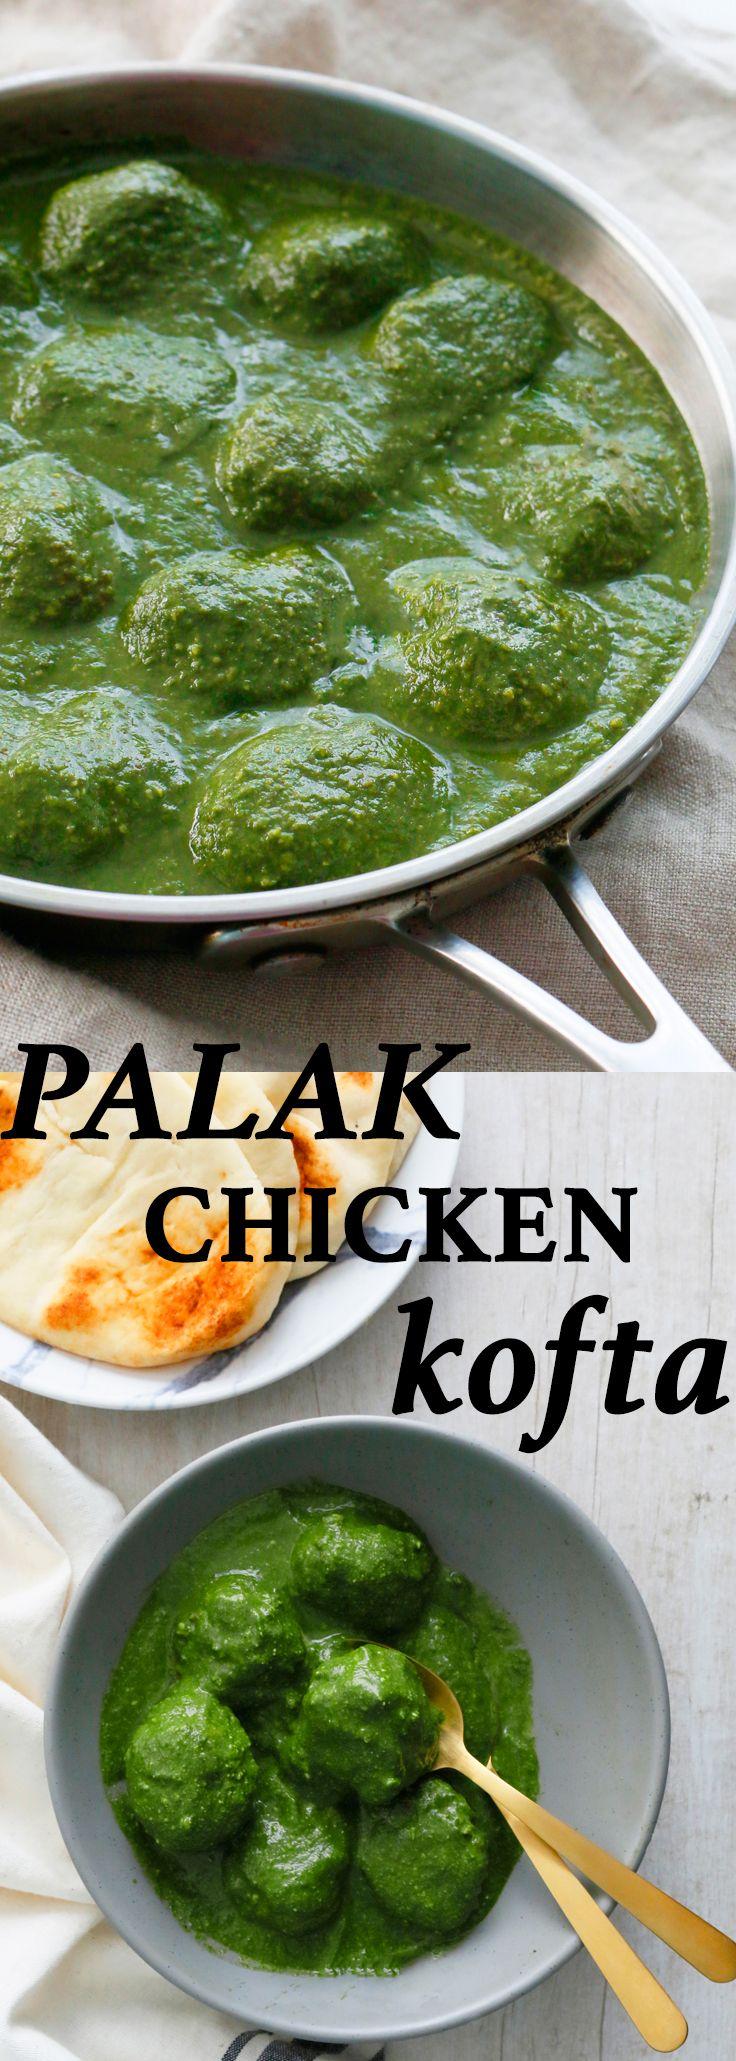 palak paneer | chicken meatballs | kofta | indian chicken recipes | indian dinner recipes | clean eating recipes| dinner ideas | dinner recipes | lunch recipes